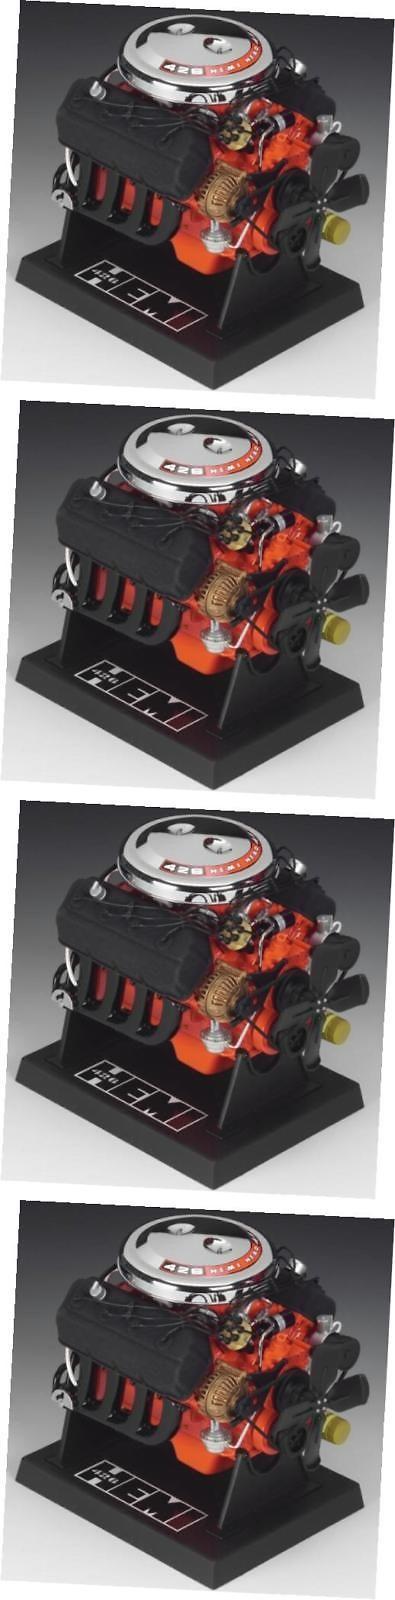 Hot Rod 2582: Hemi 426 Engine Replica, 1 6Th Scale Die Cast -> BUY IT NOW ONLY: $55.53 on eBay!